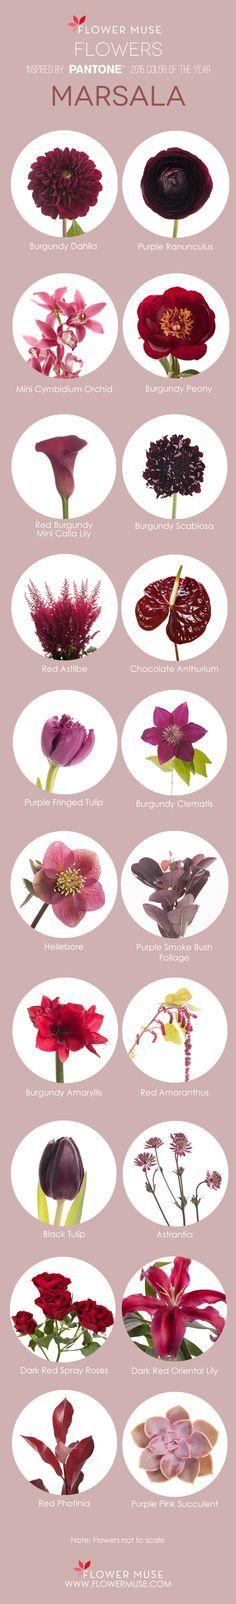 2015 Color of The Year Marsala Flower Inspiration - on Flower Muse Blog: http://www.flowermuse.com/blog/marsala-flowers/